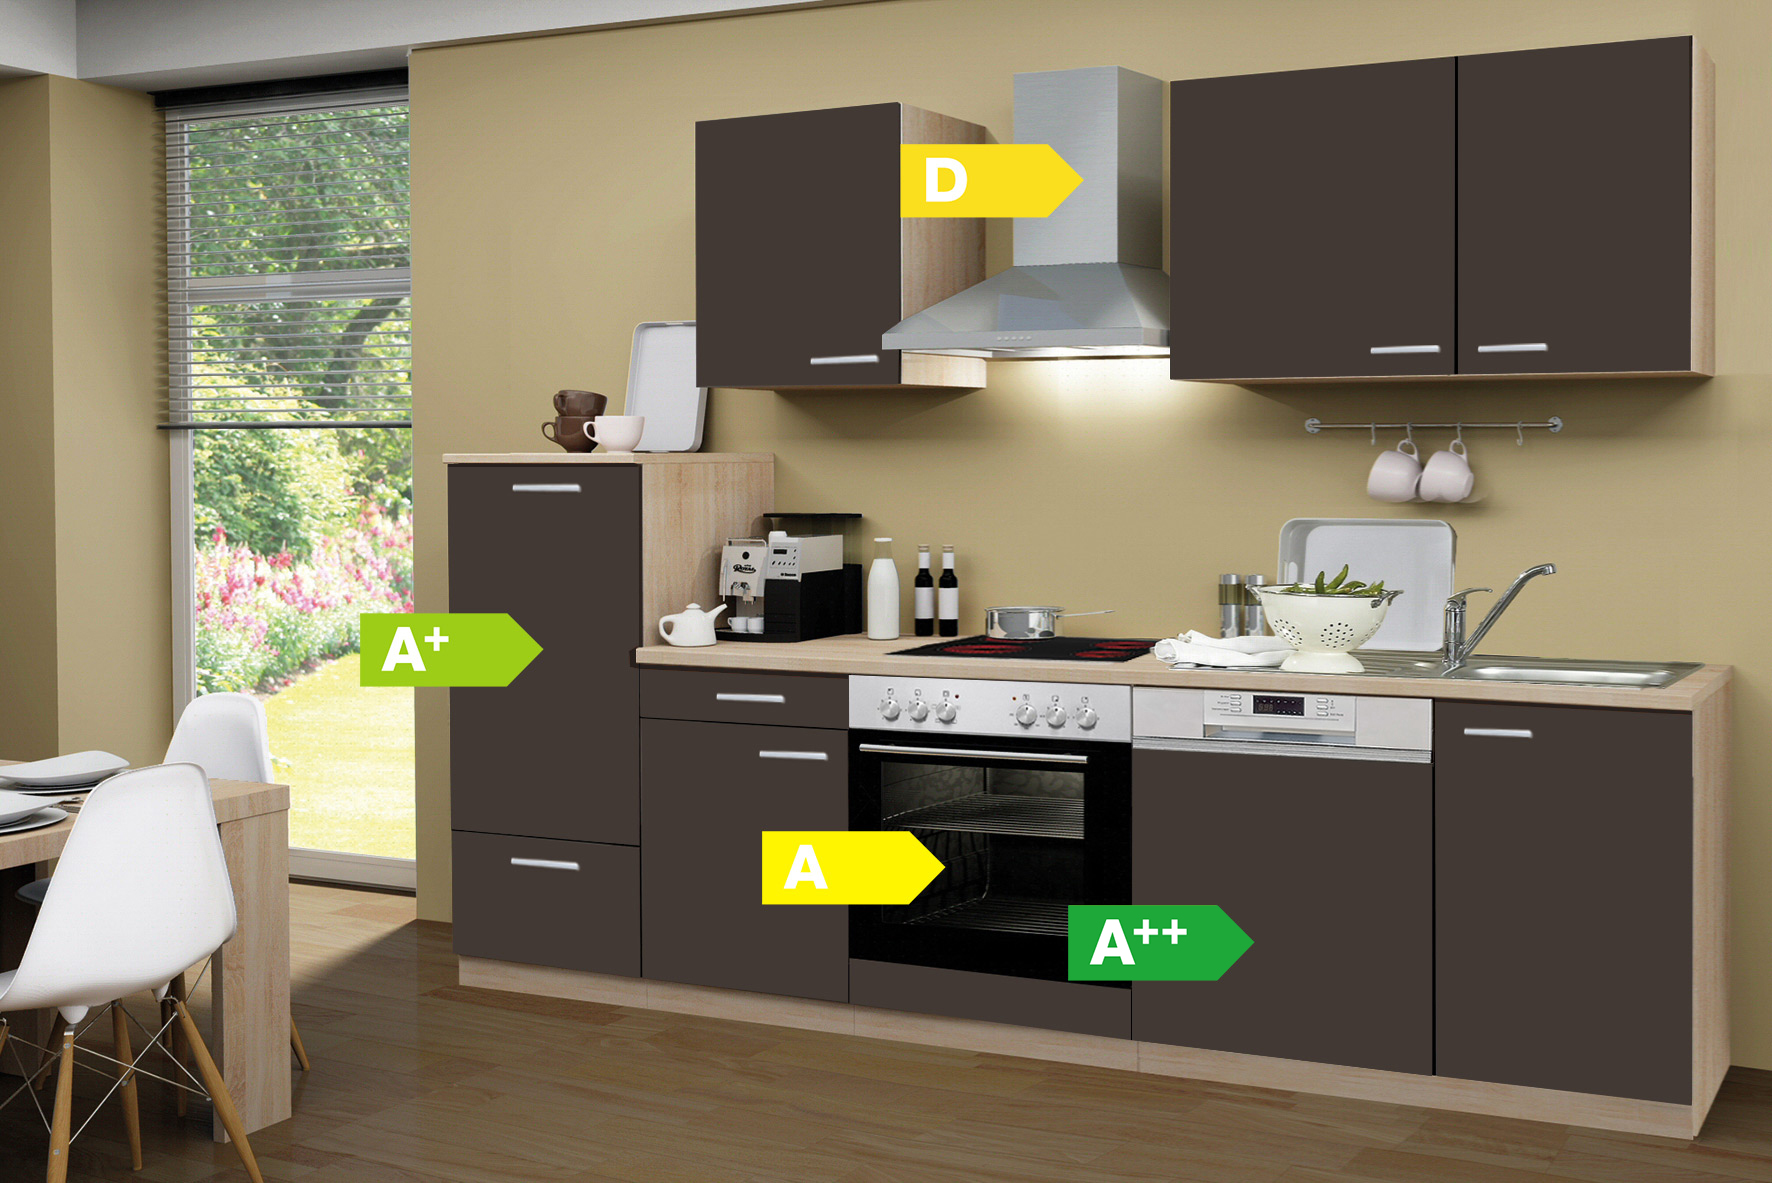 menke k chen k chenzeile classic 280 cm k chenblock. Black Bedroom Furniture Sets. Home Design Ideas